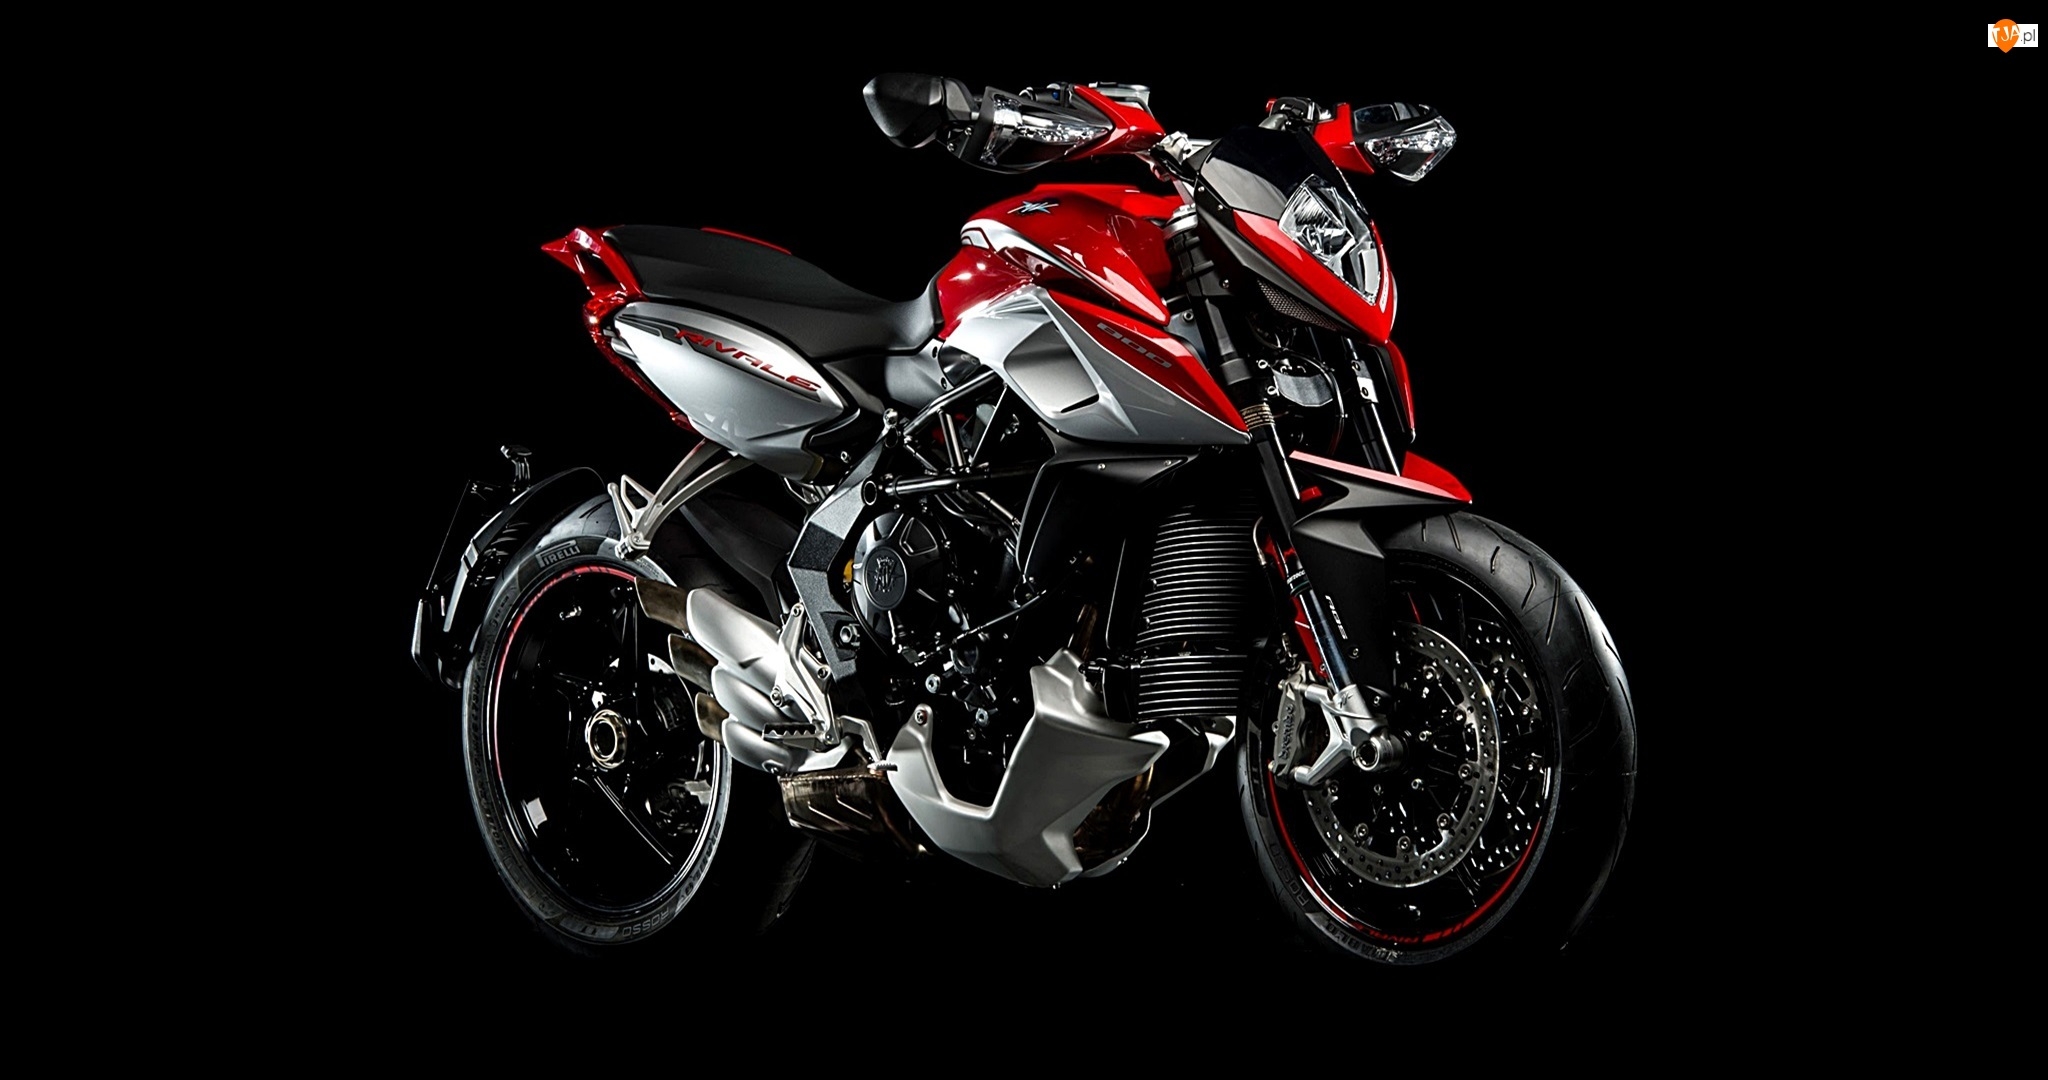 2016, Motocykl, MV Agusta Rivale 800